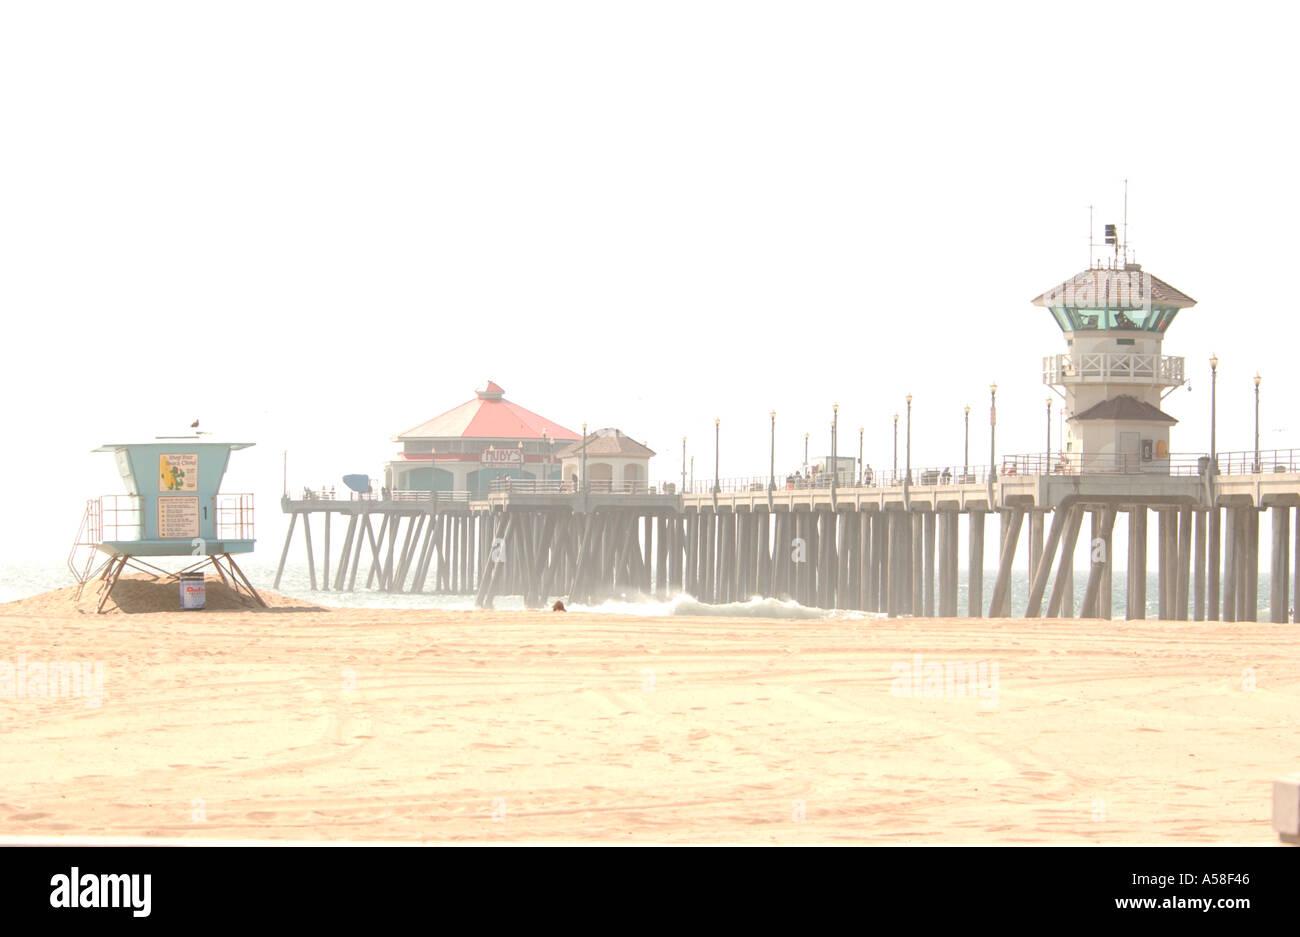 Pier, Beach and Lifeguard Hut - Stock Image